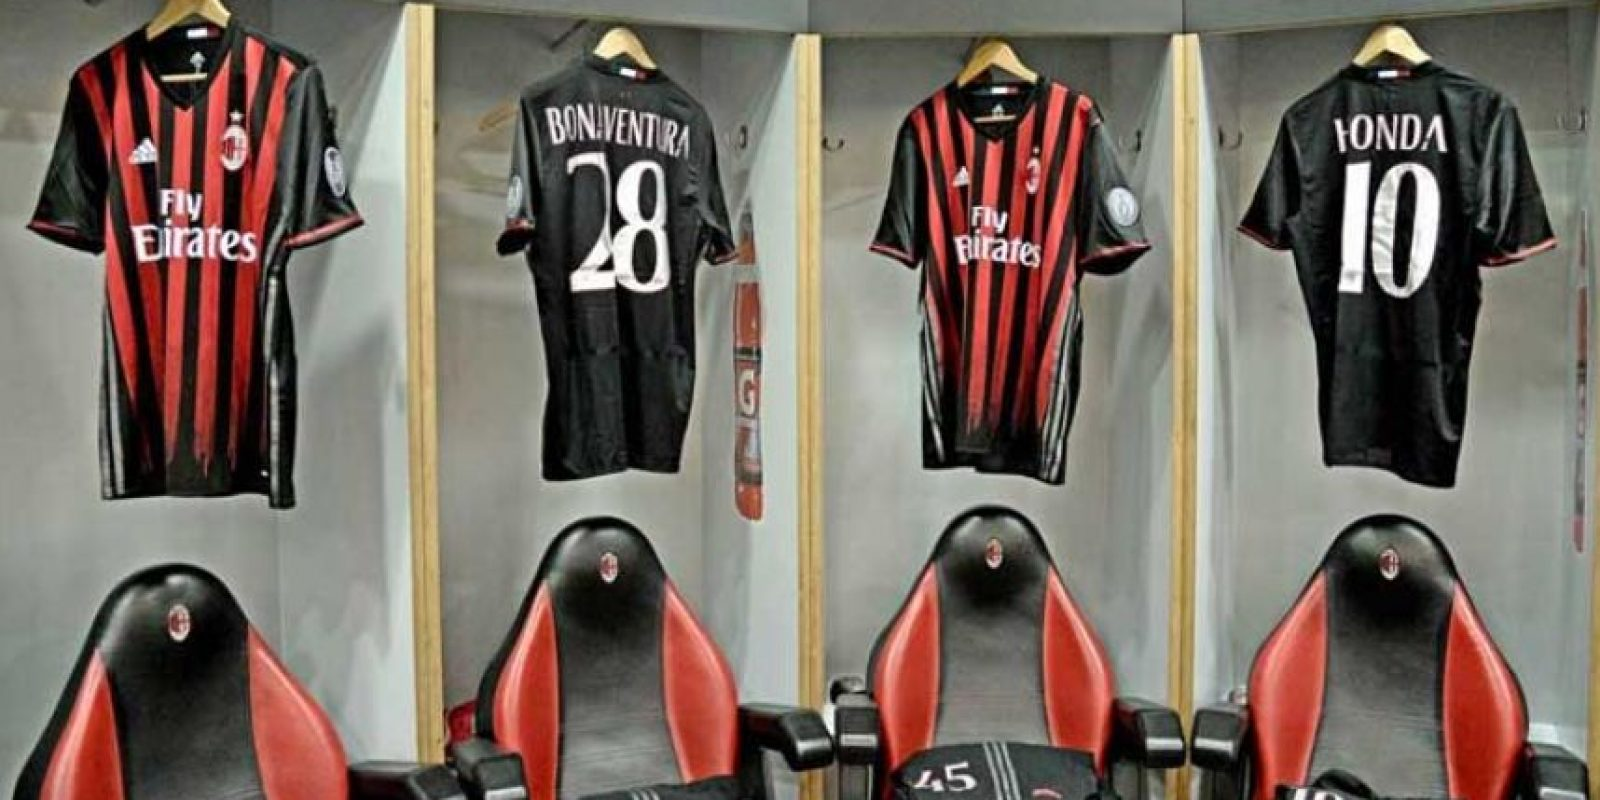 Foto:Vía instagram.com/adidasfootball